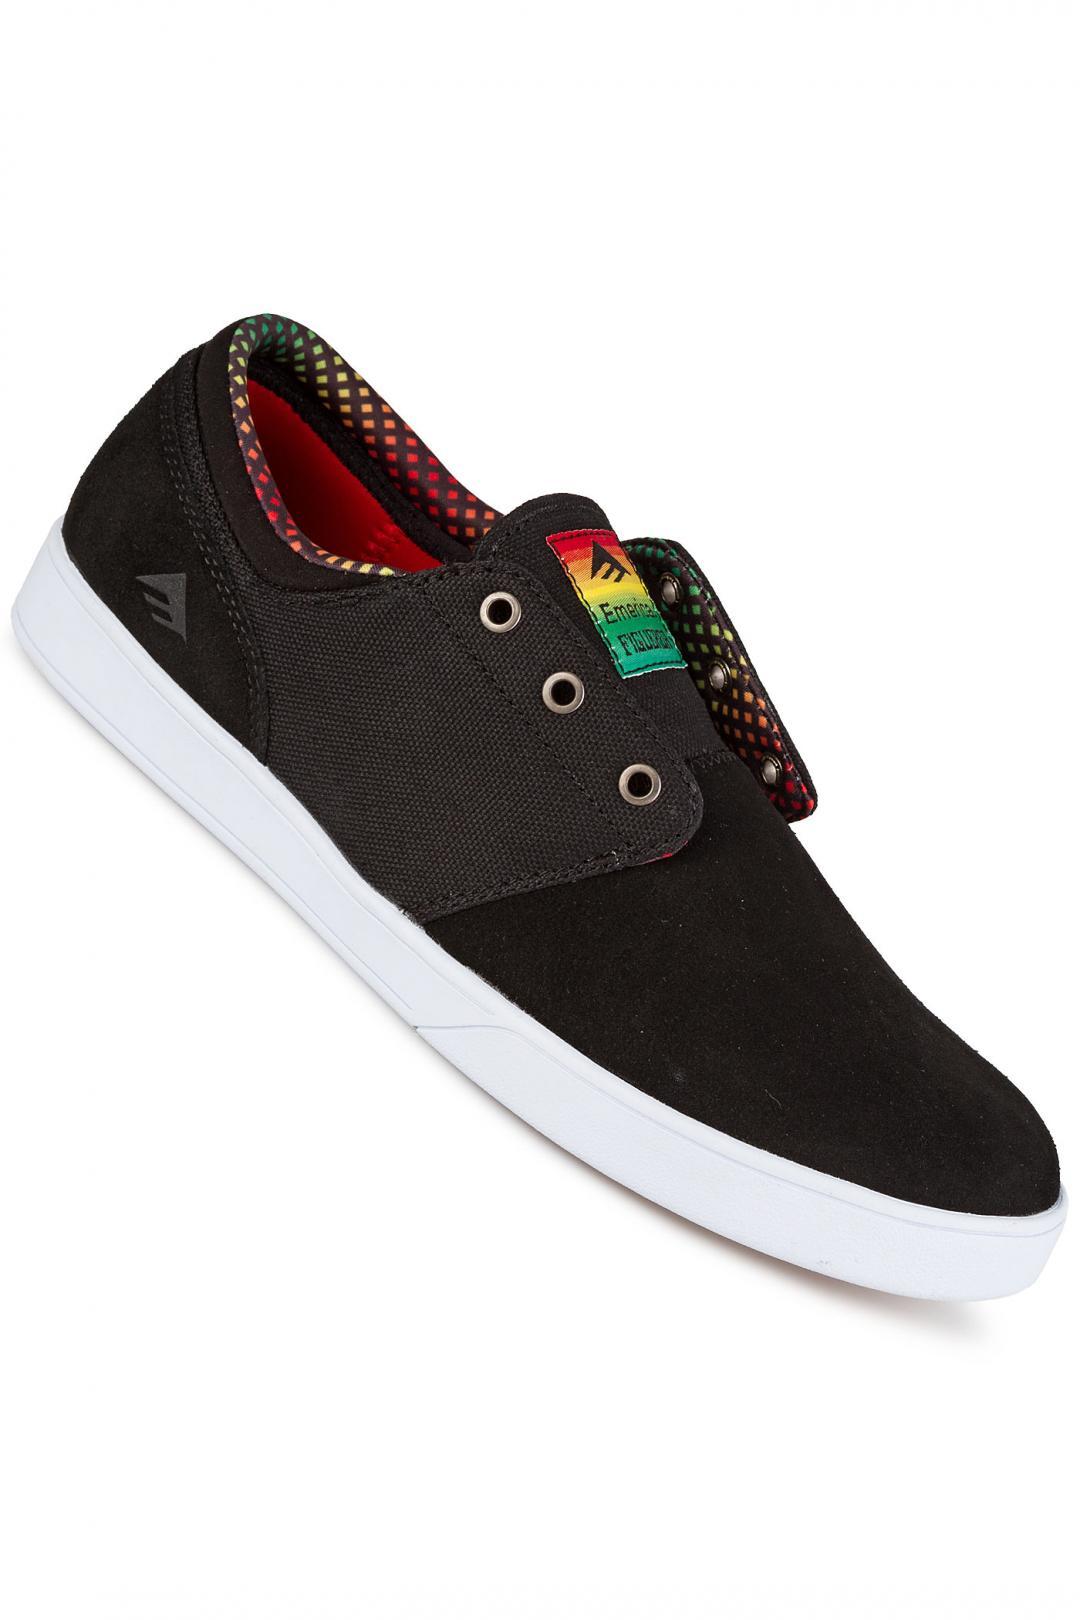 Uomo Emerica The Figueroa black yellow black   Sneaker